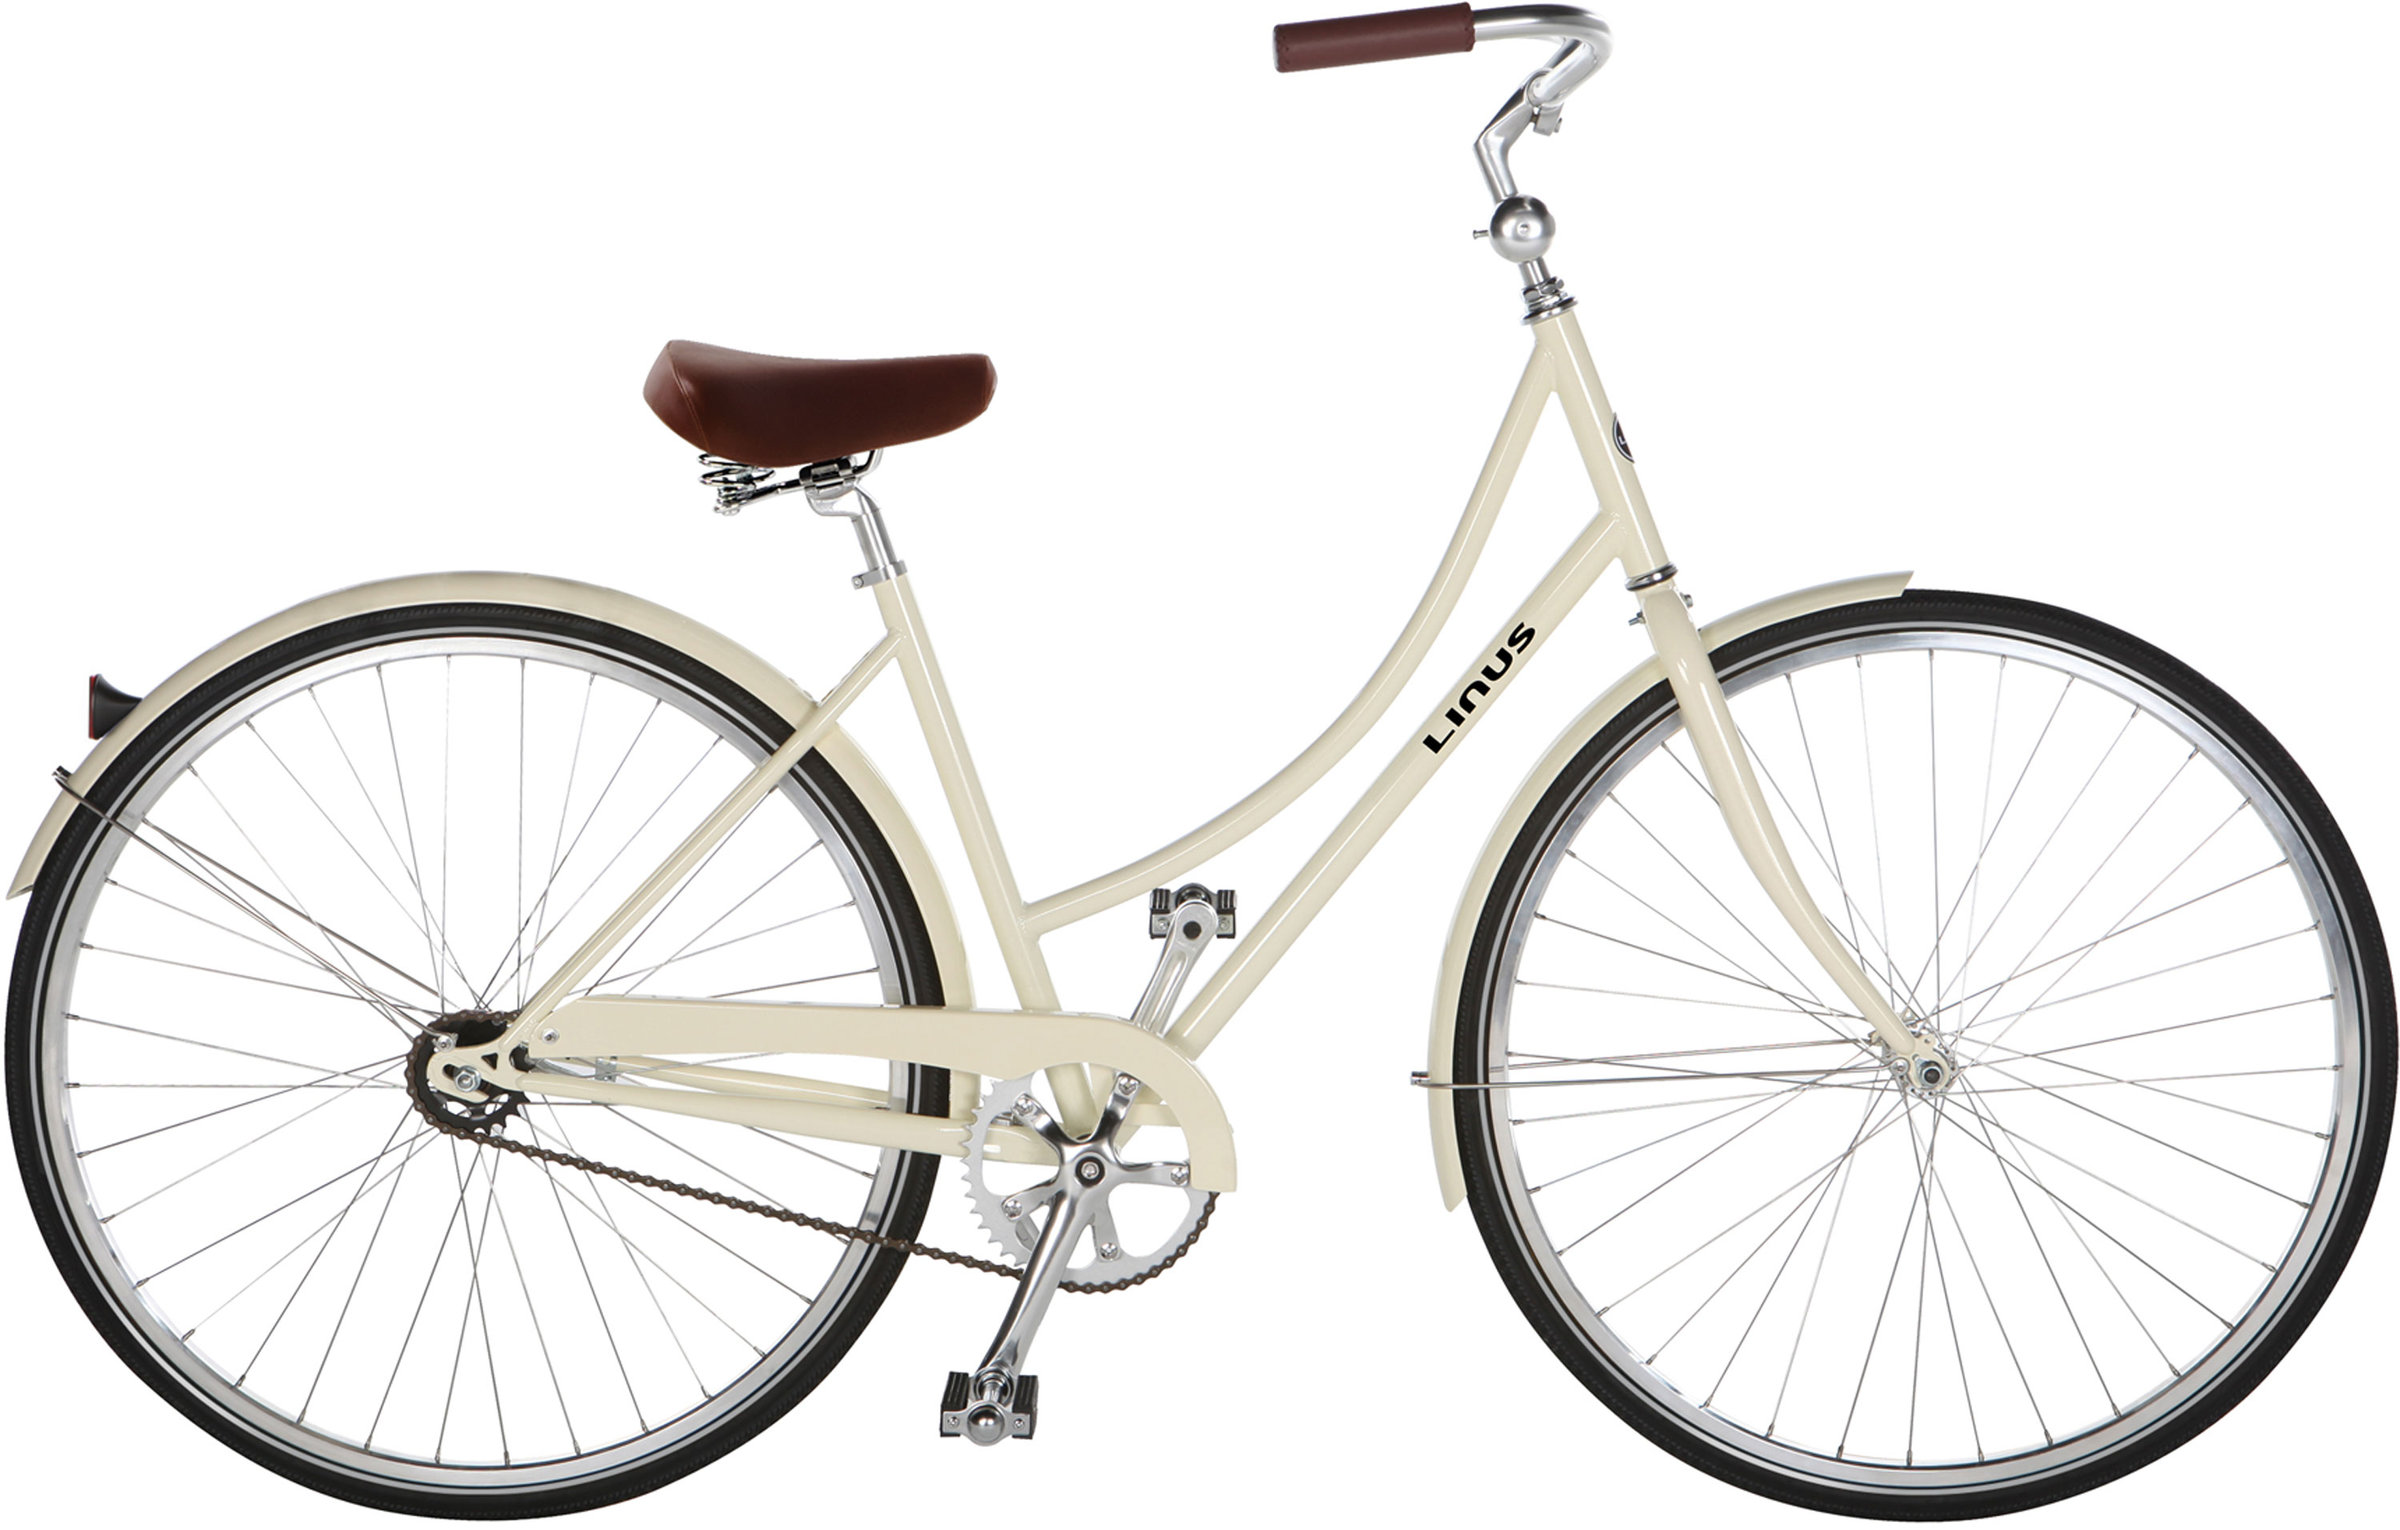 ec9d0625083 Linus Dutchi 1 - Women's - Freedom Bike Shop Penticon BC